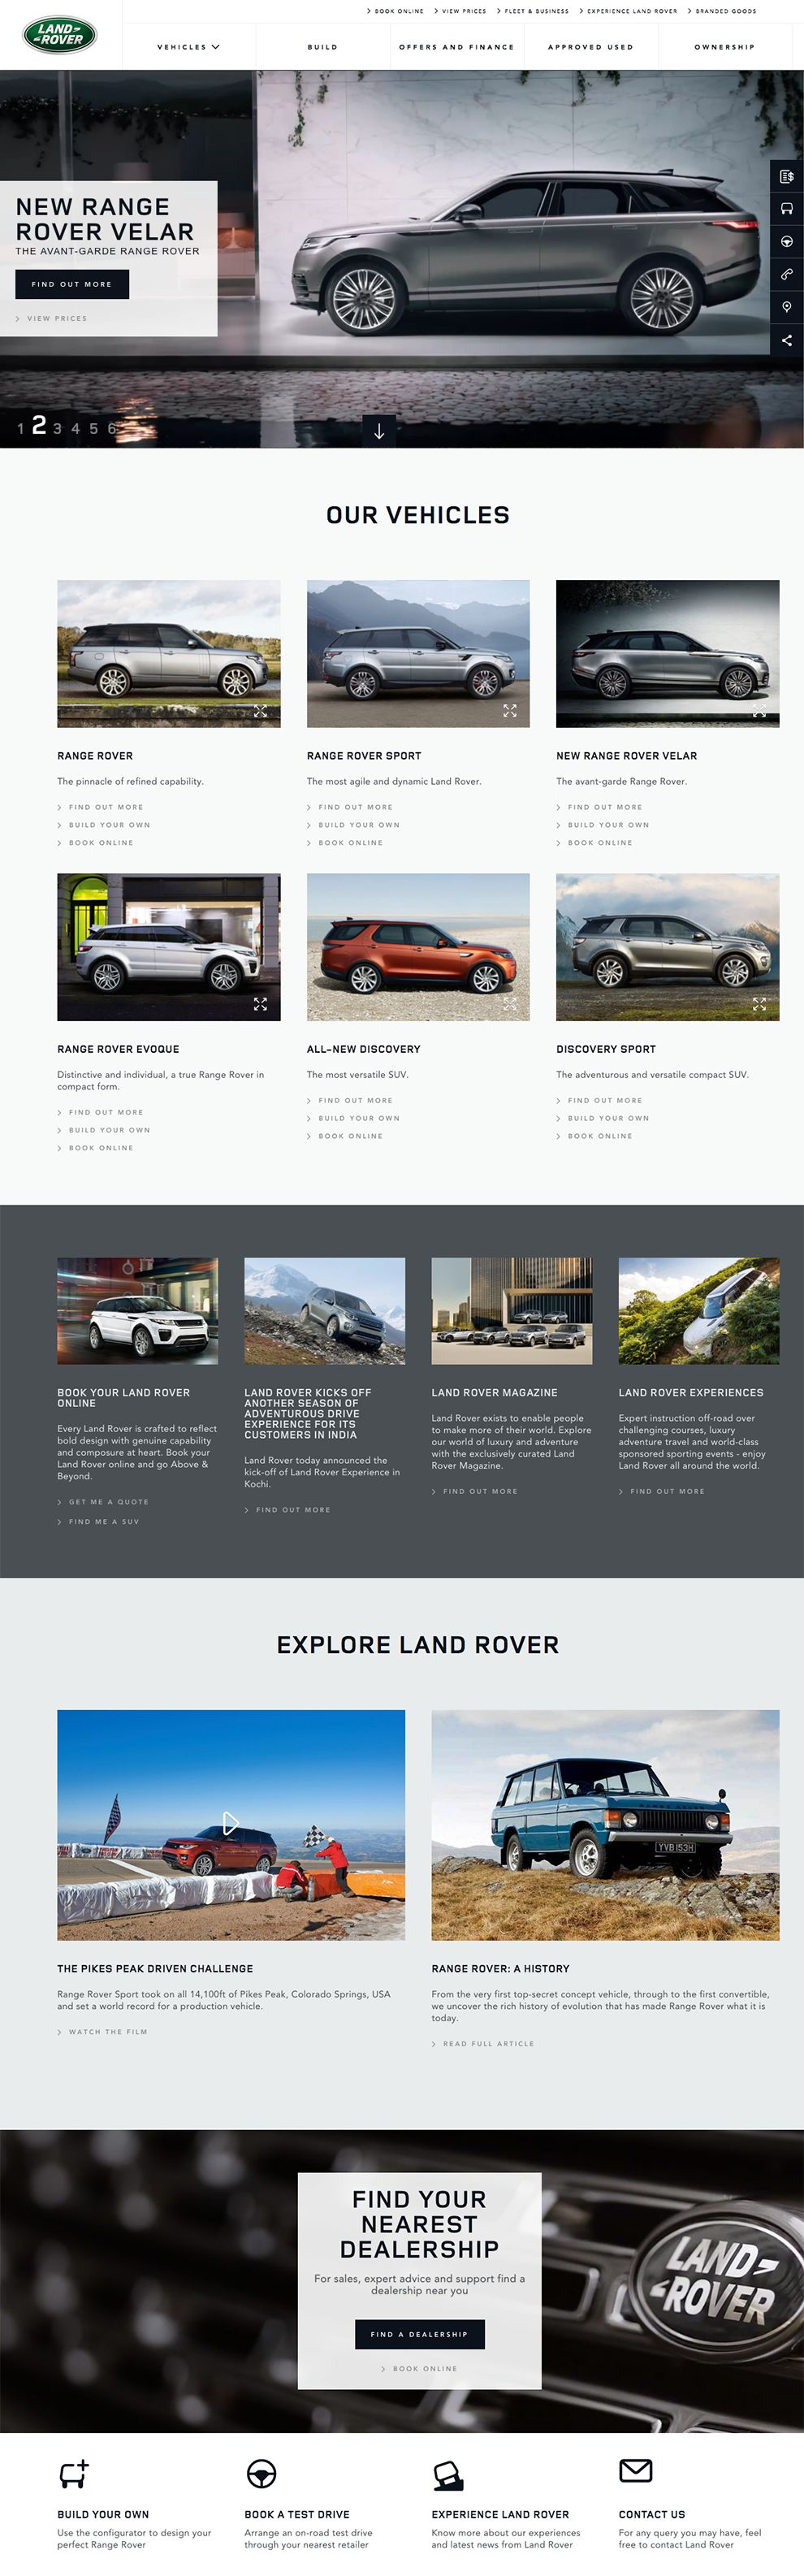 Land Rover India (slide 1)